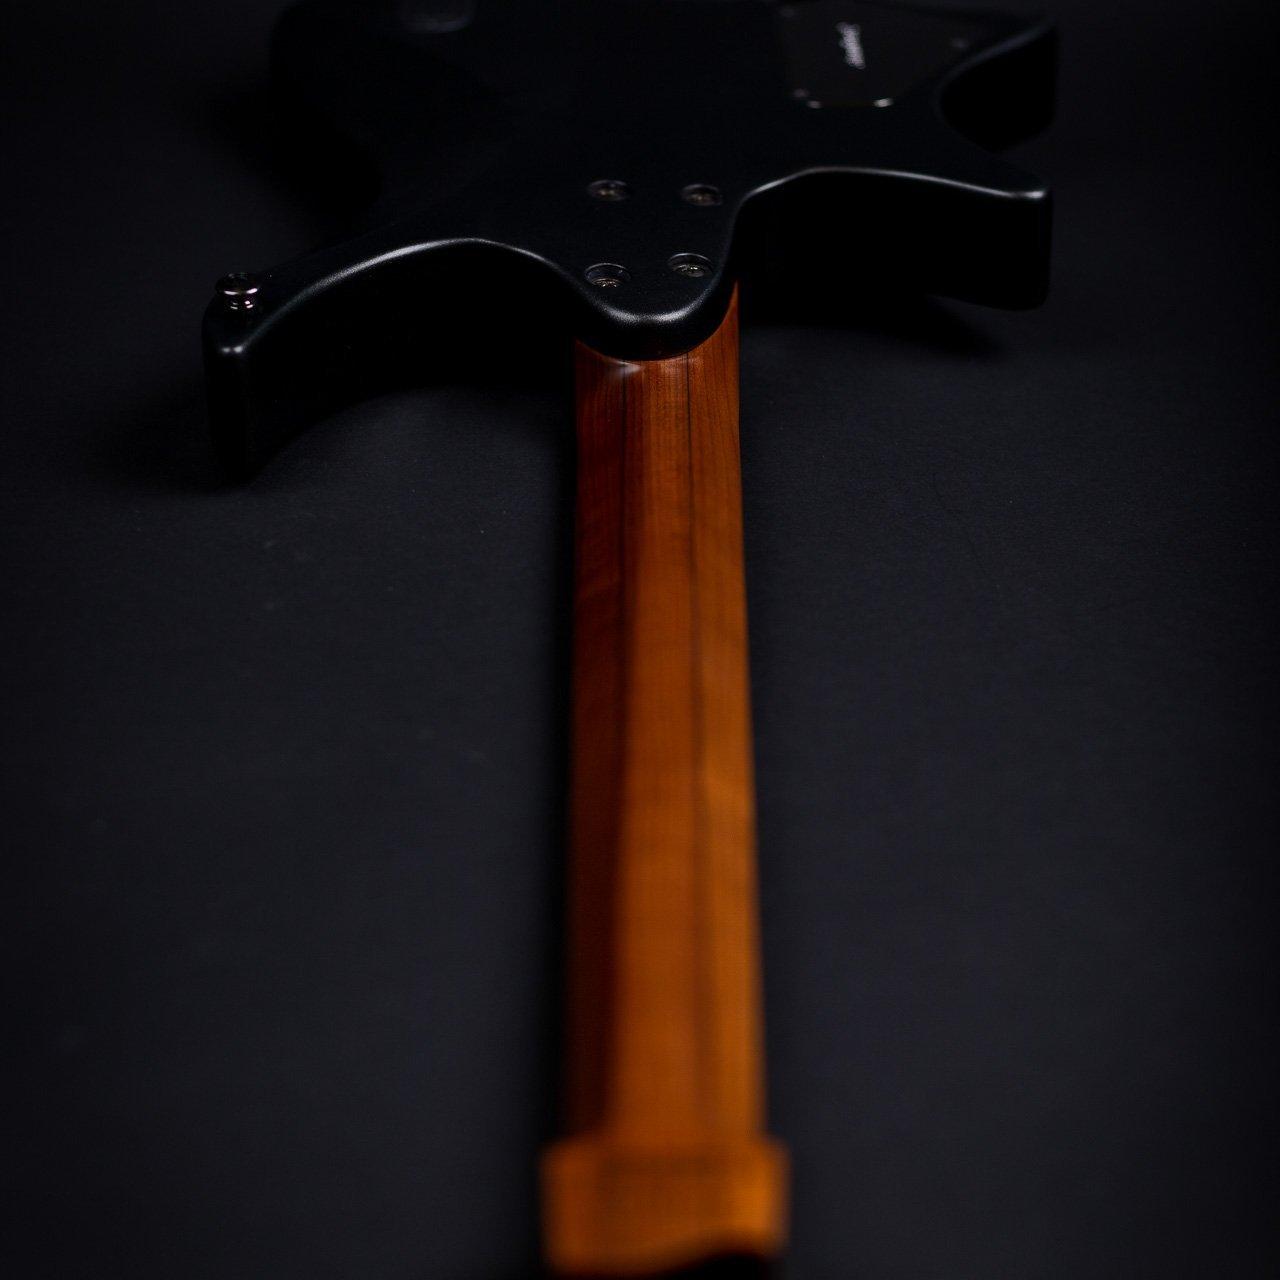 Headless guitar boden metal black 7 string back view